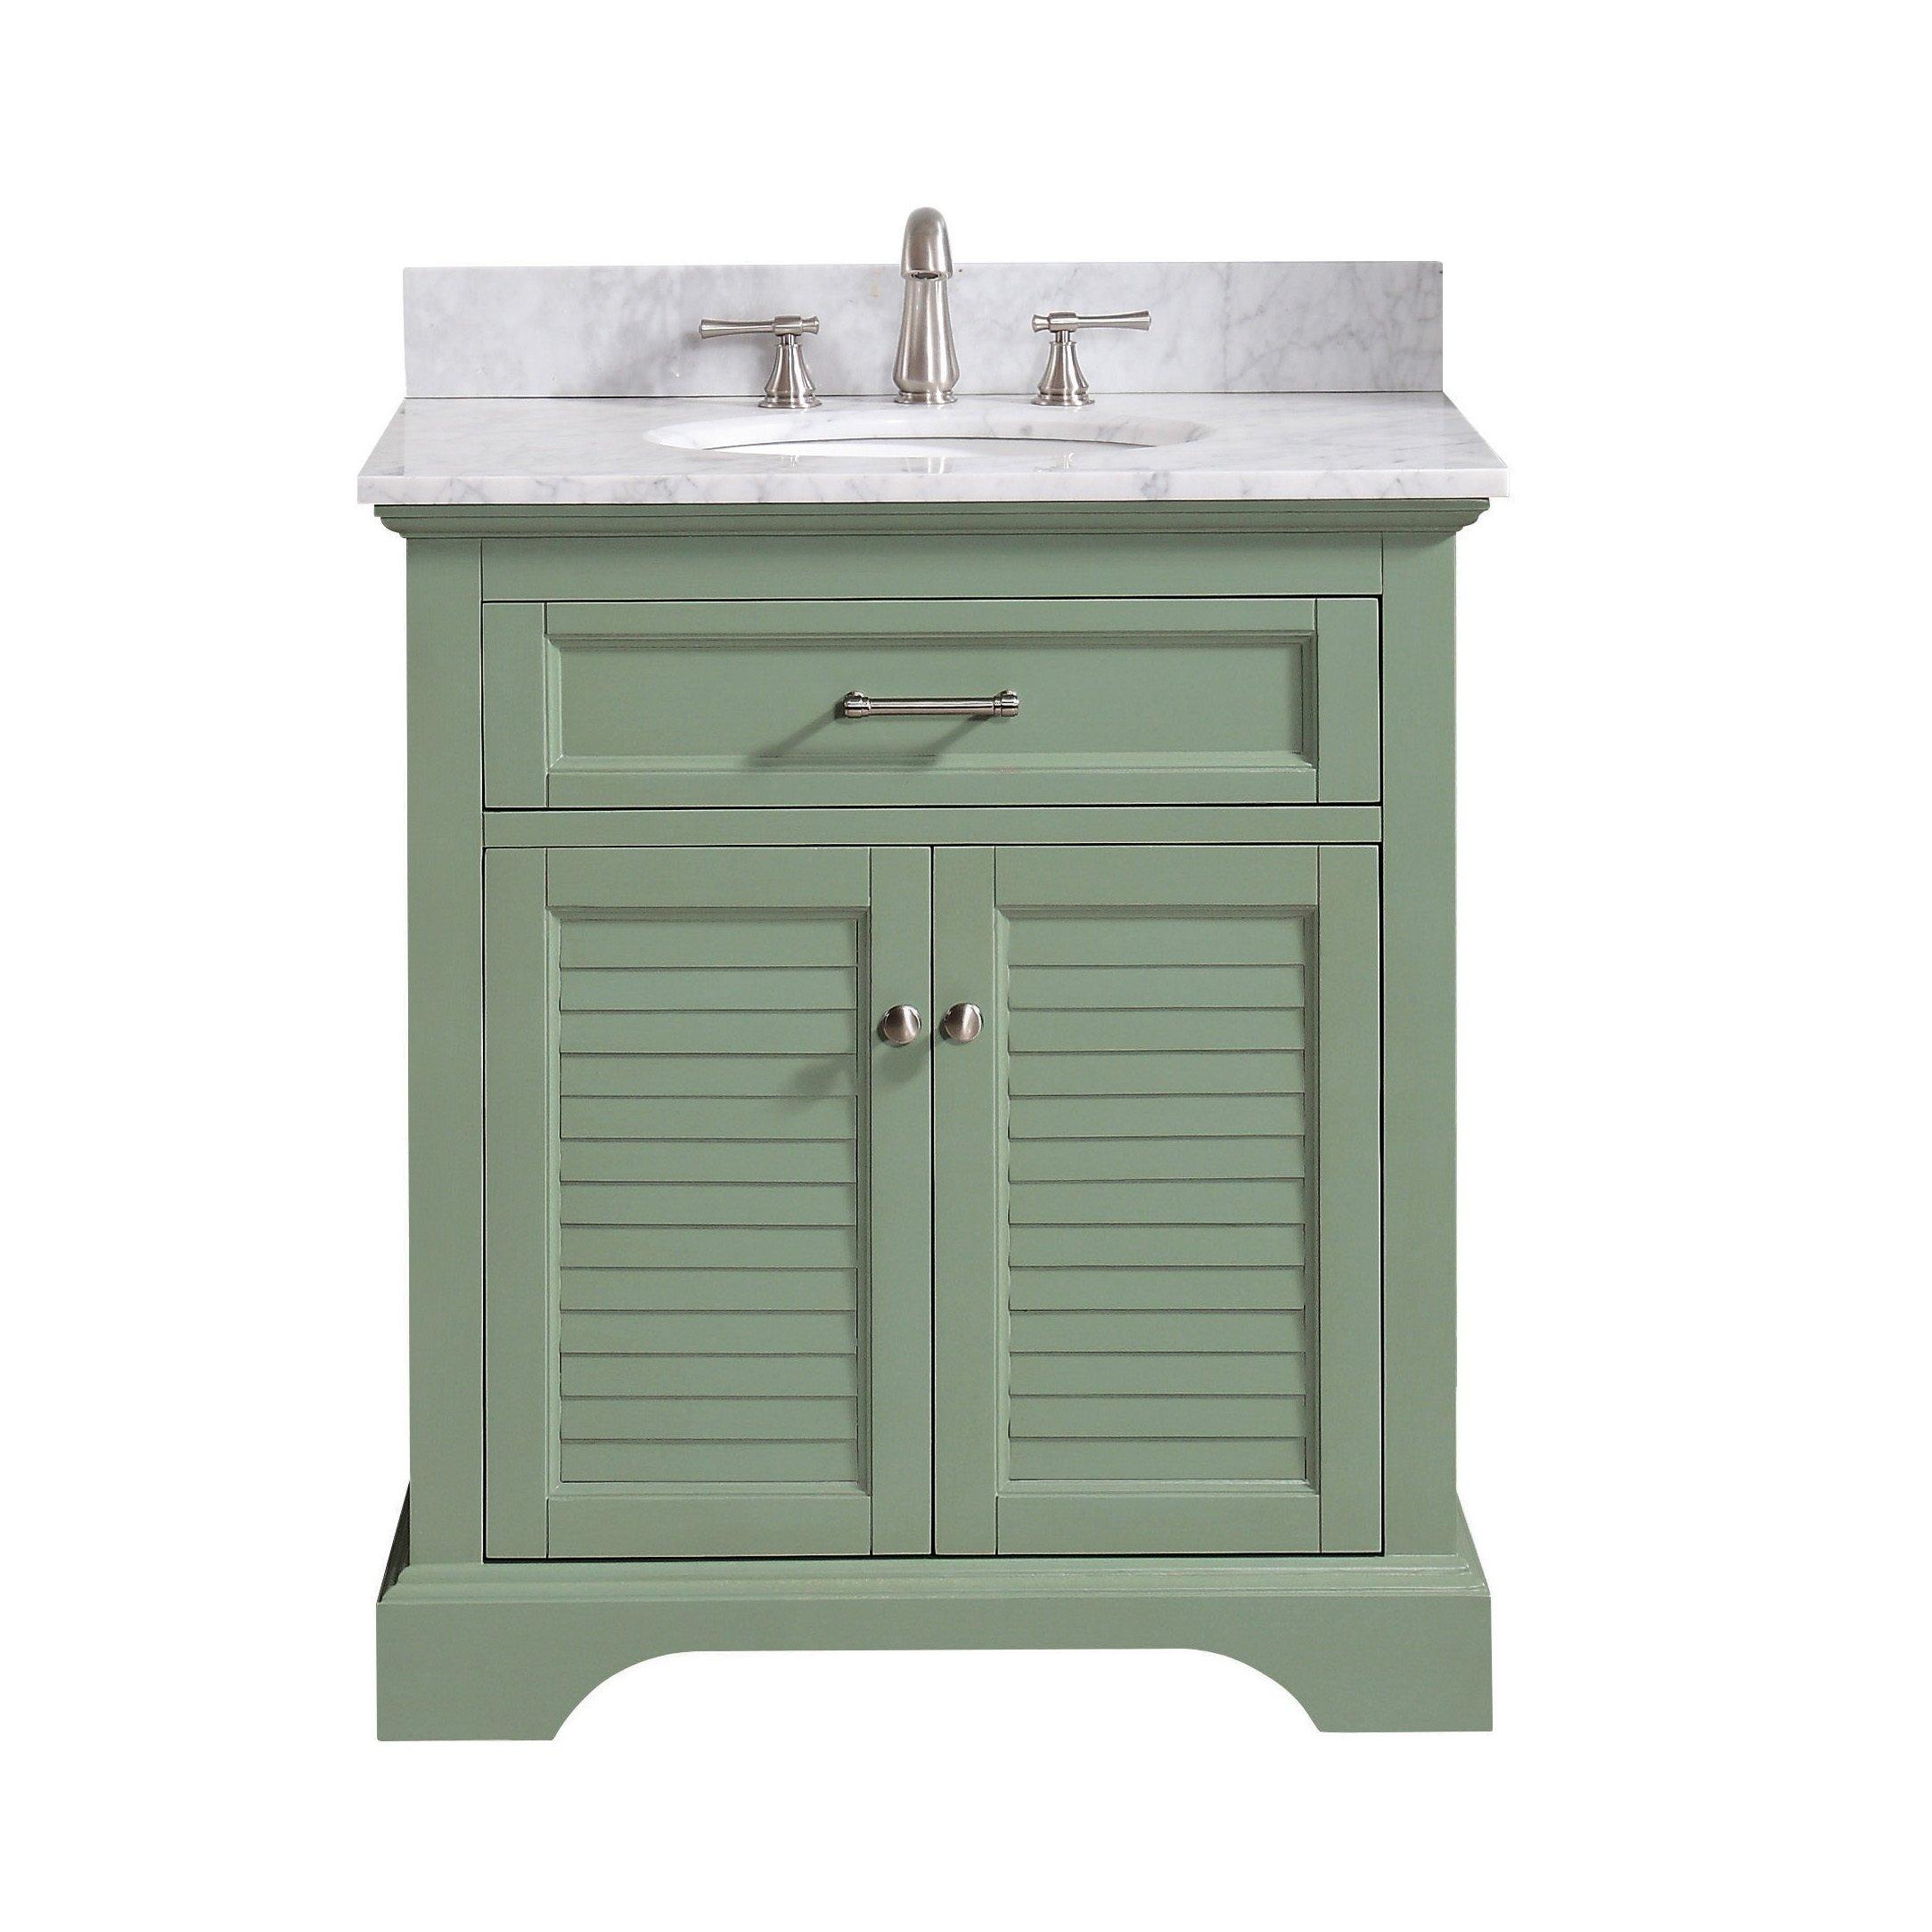 Avanity Colton 31 In Vanity Combo In Basil Green With Carrara